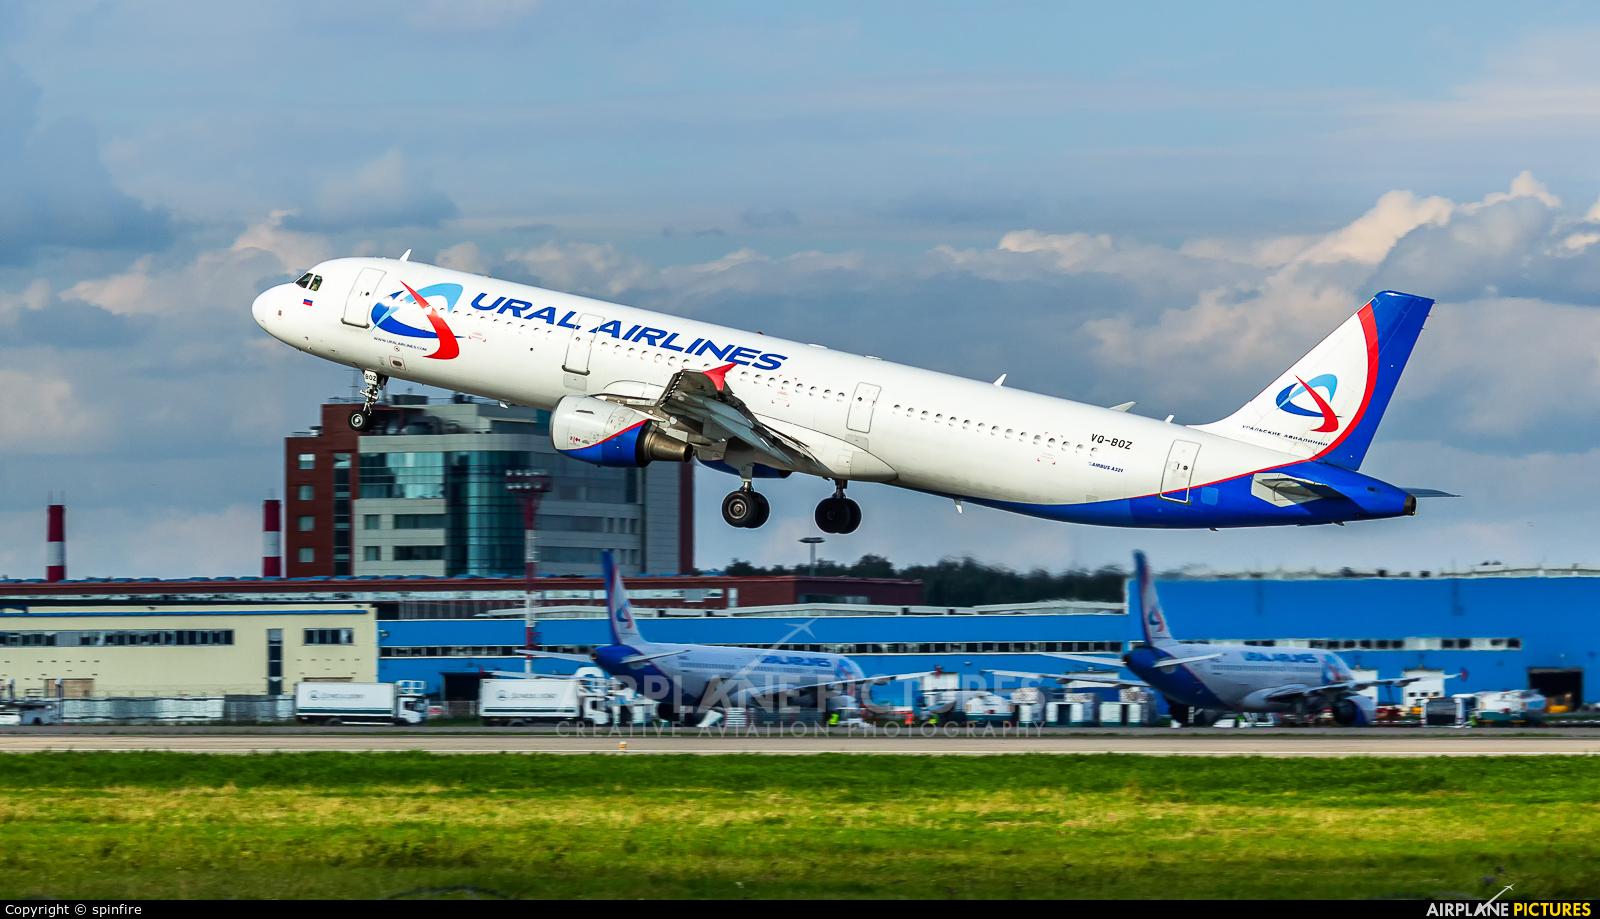 Ural Airlines VQ-BOZ aircraft at Moscow - Domodedovo